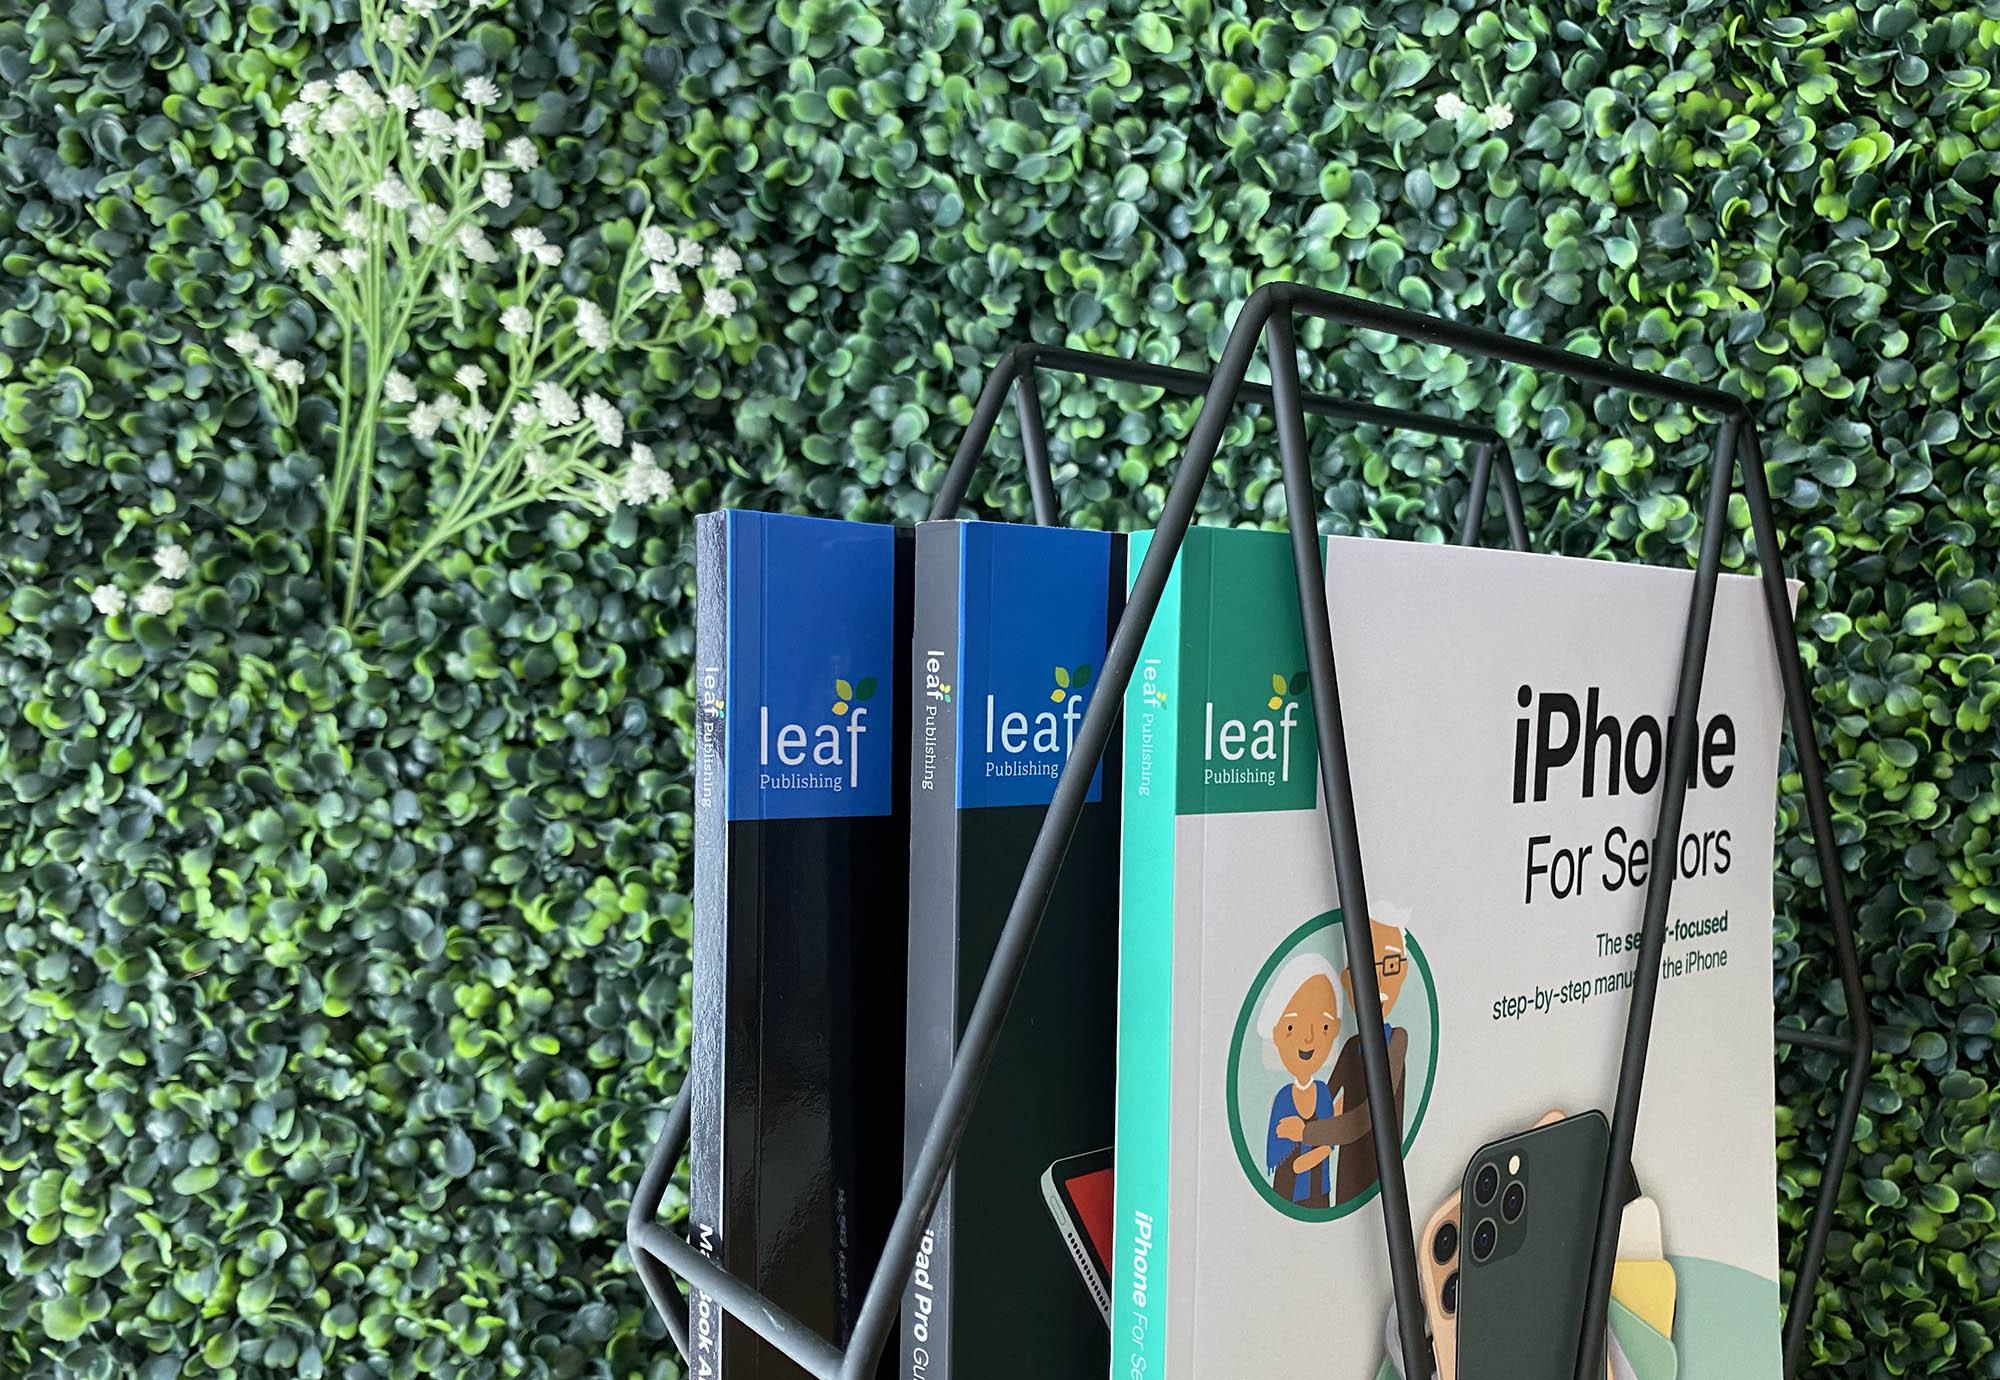 iPhone For Seniors a bestseller